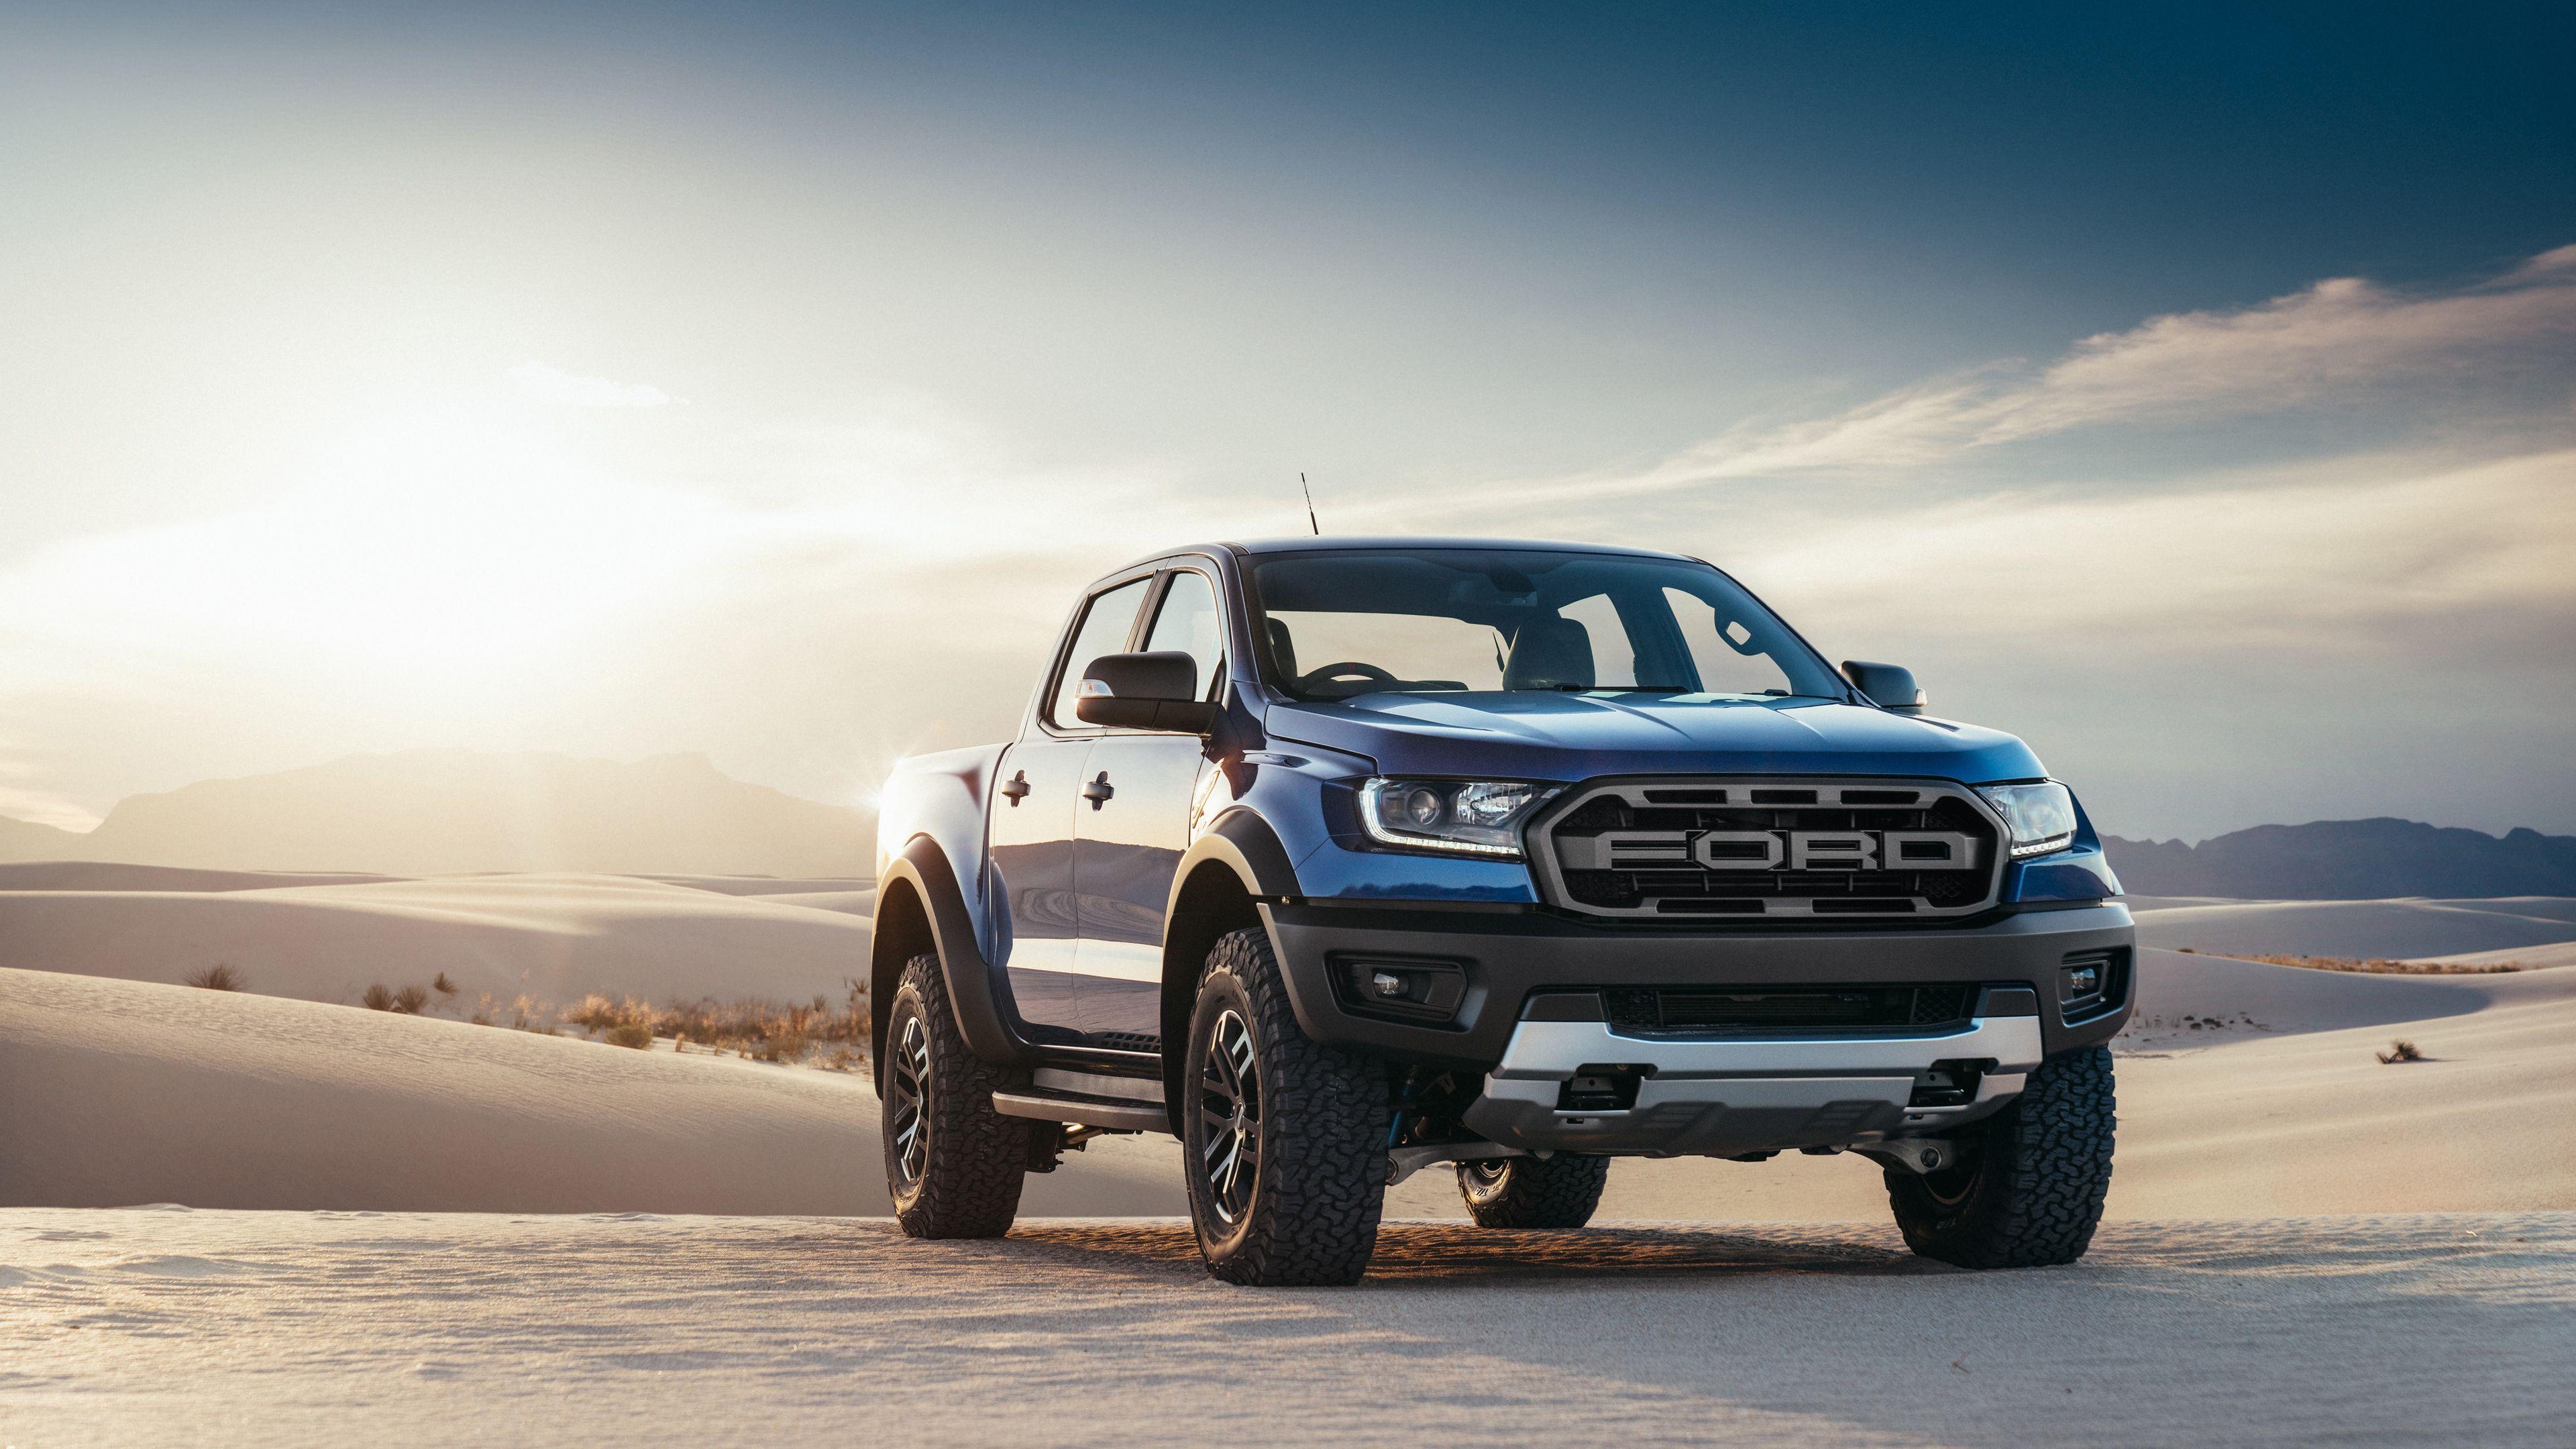 Pin On Best Trucks Vehicles